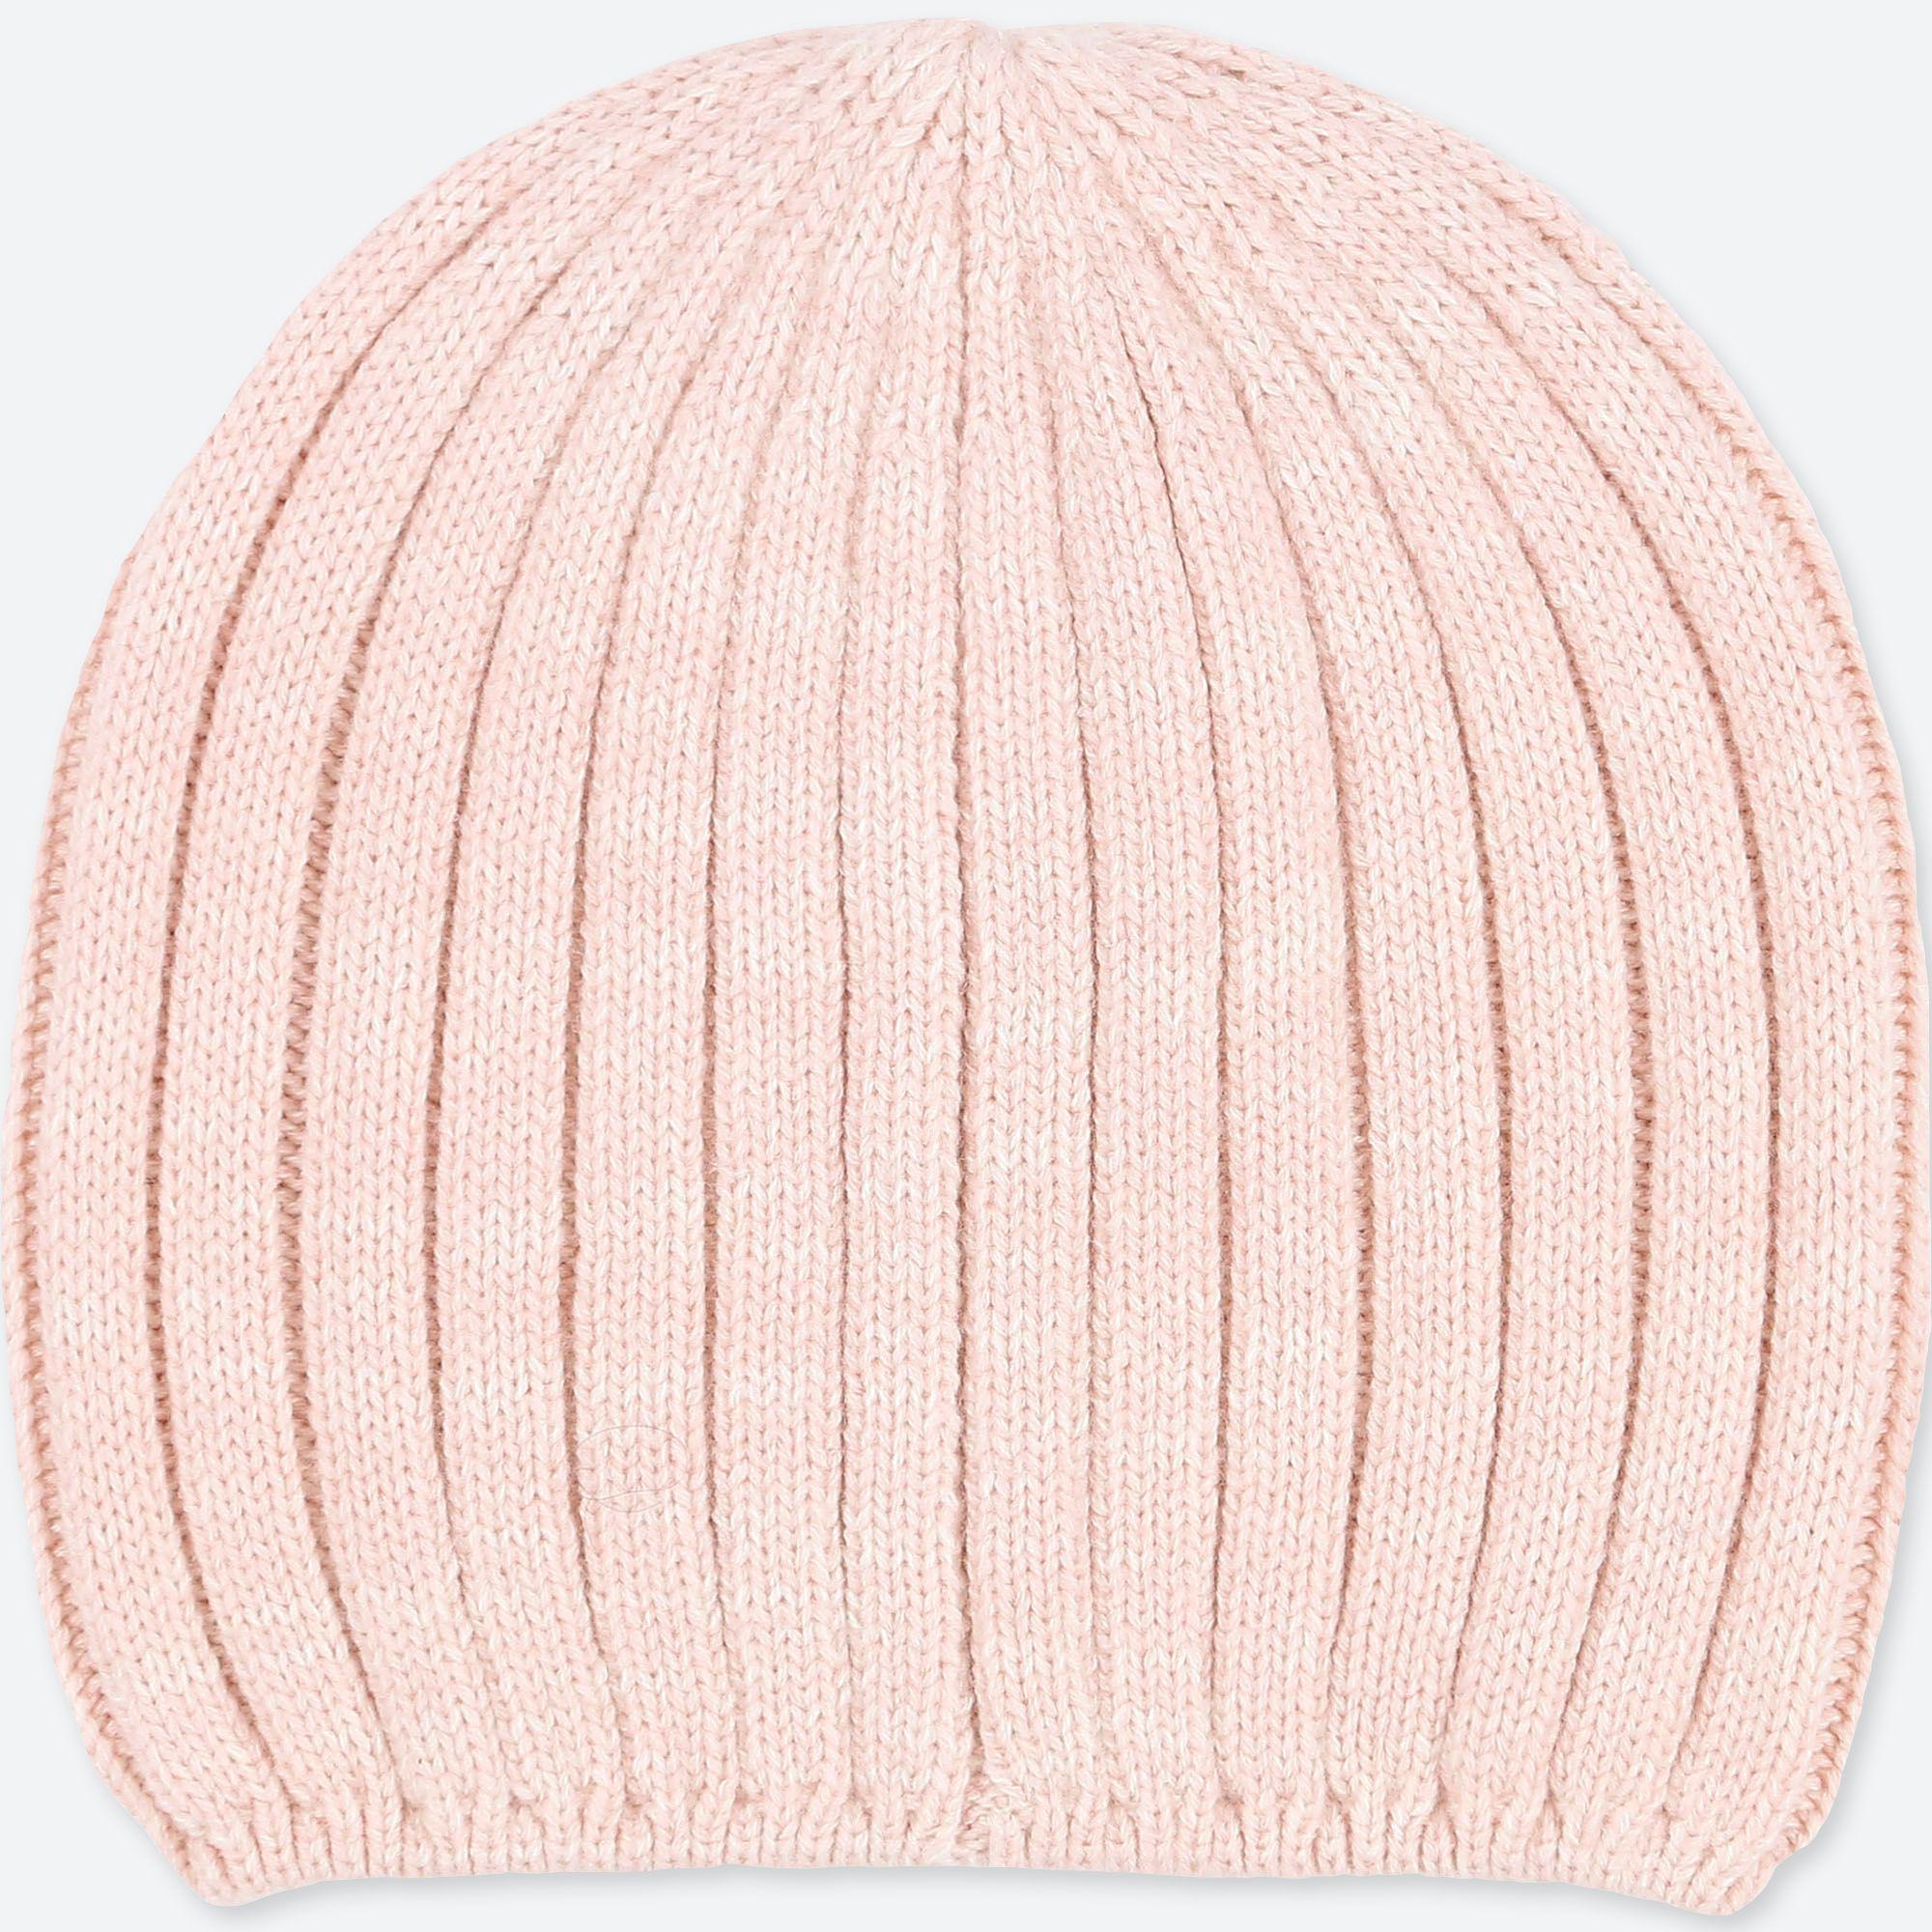 7f6d96ec71c55 Uniqlo Heattech Knitted Beanie Hat in Pink - Lyst